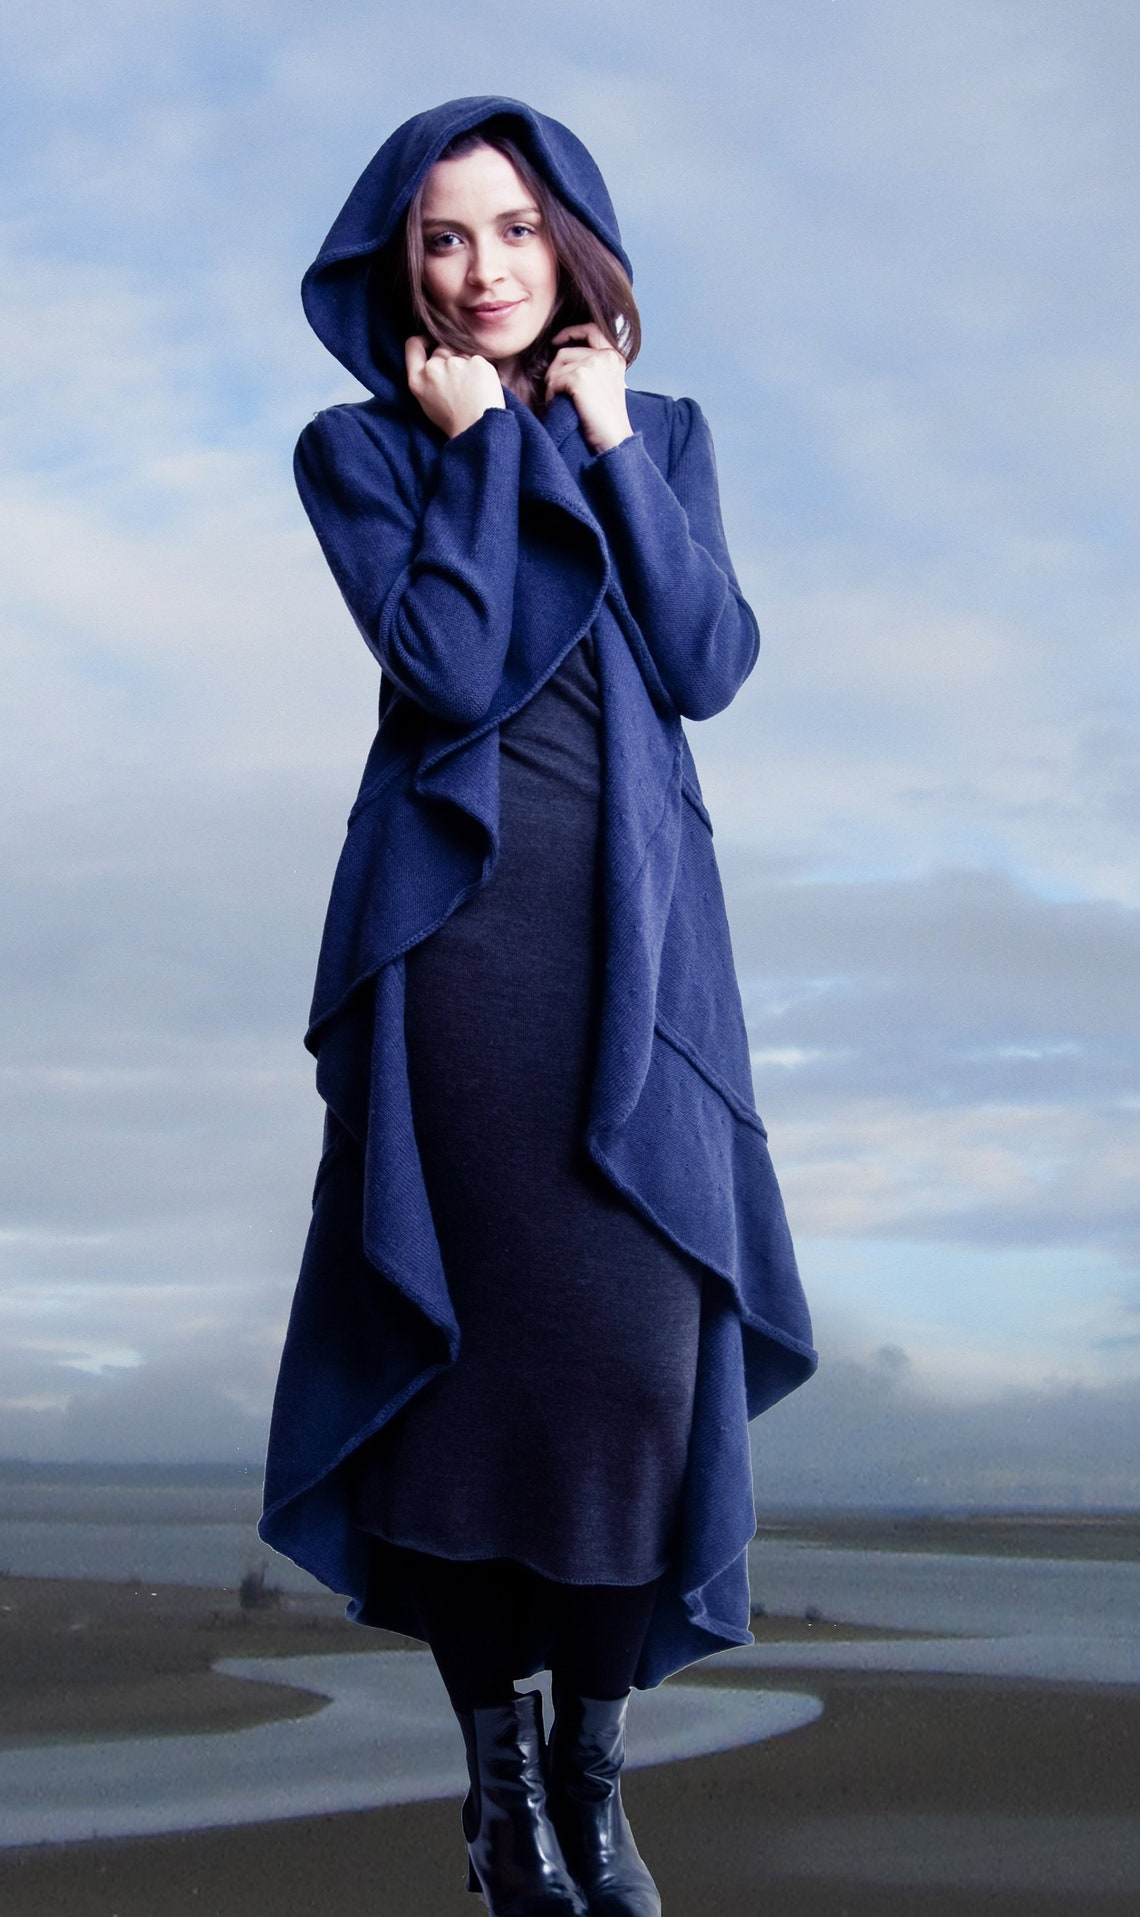 100% Extra Fine Merino Wool Coat - The Spiral By Cloud9knitwear